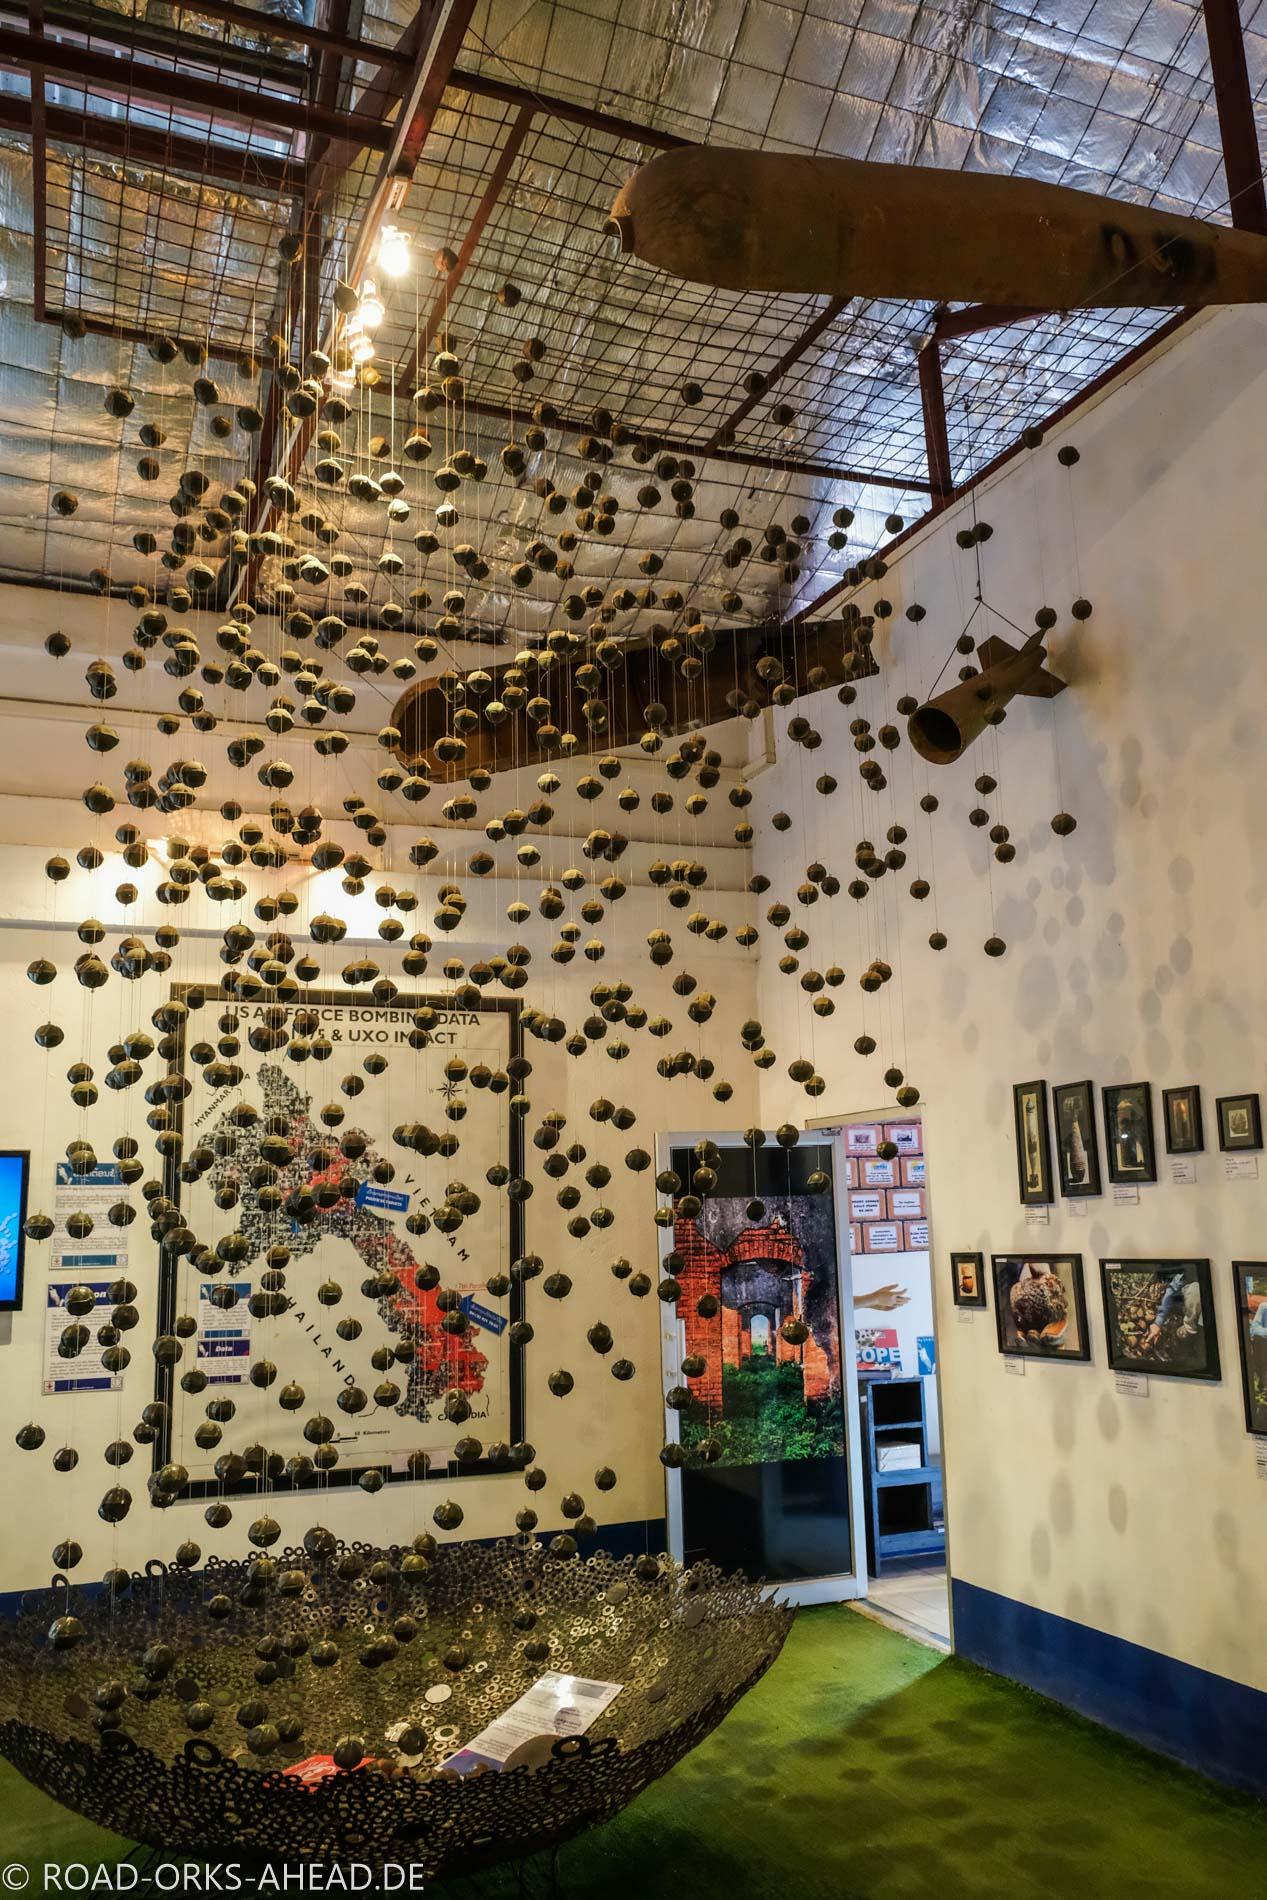 COPE - Streubomben, Vientiane